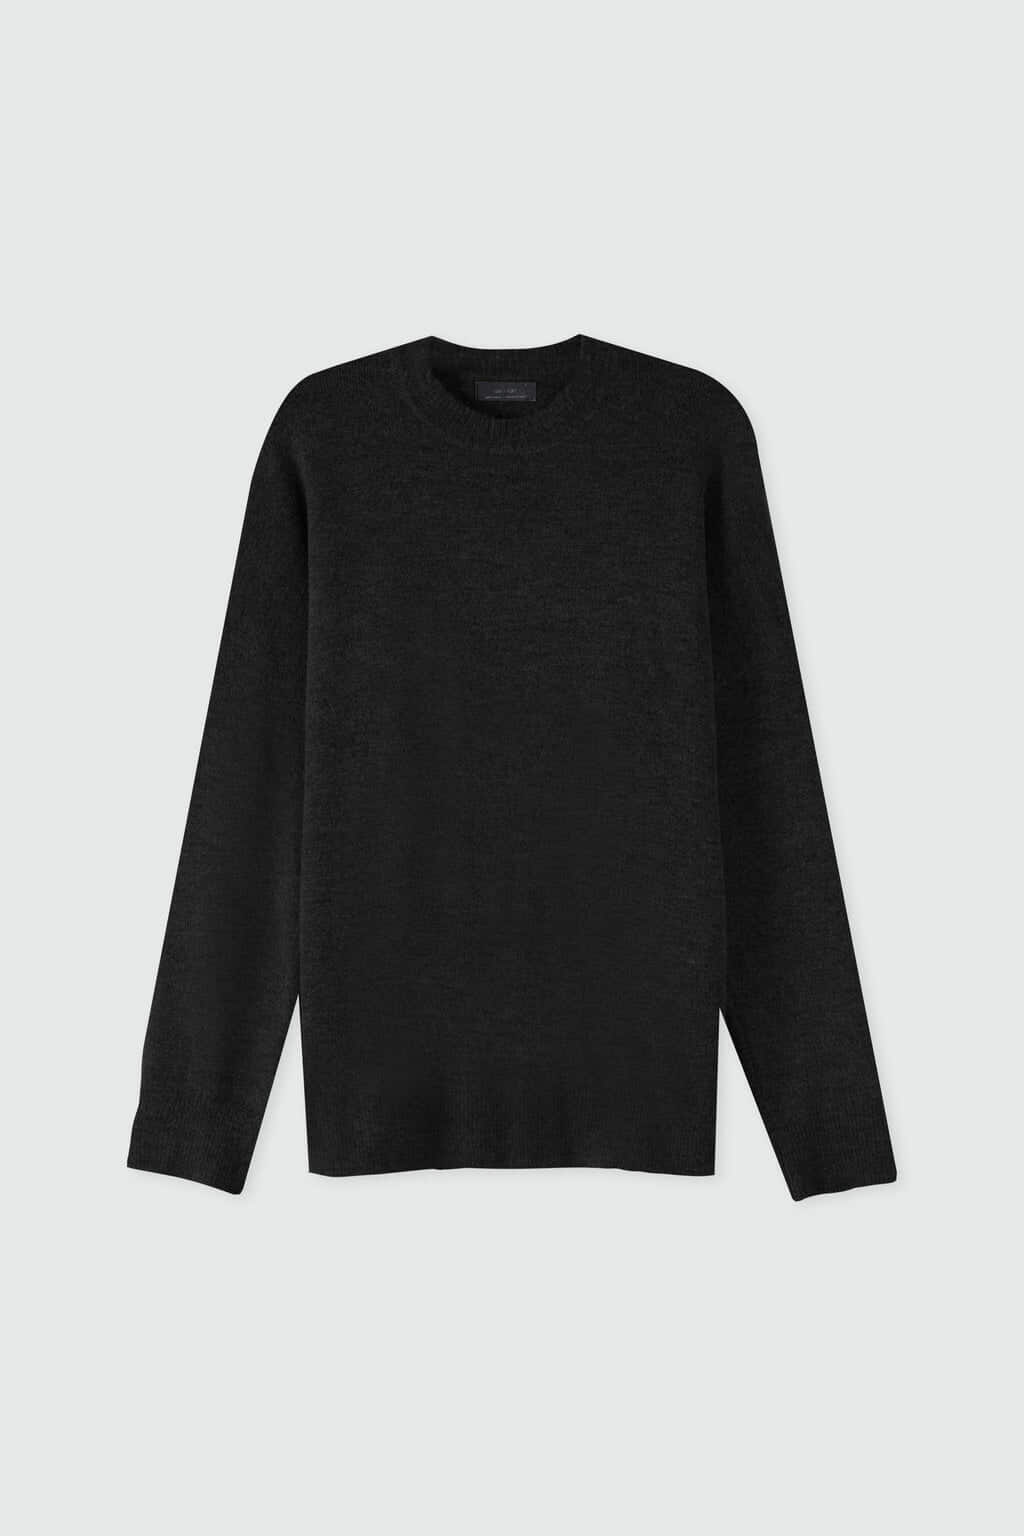 Sweater 2482 Black 17